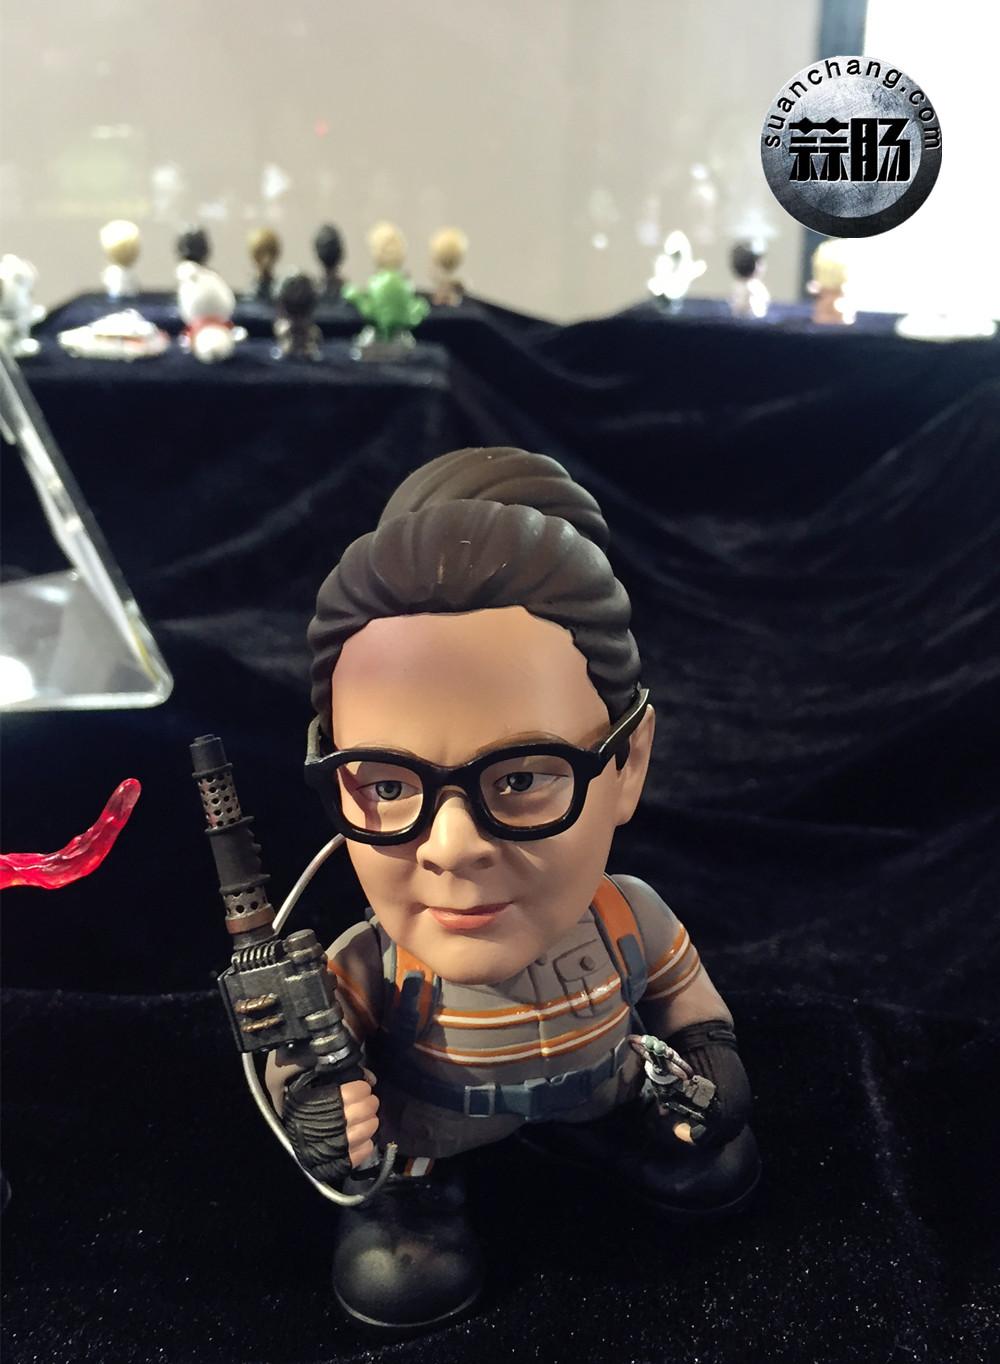 Soldier Story 推出的《捉鬼敢死队3》新角色人偶及周边产品亮相 模玩 第8张